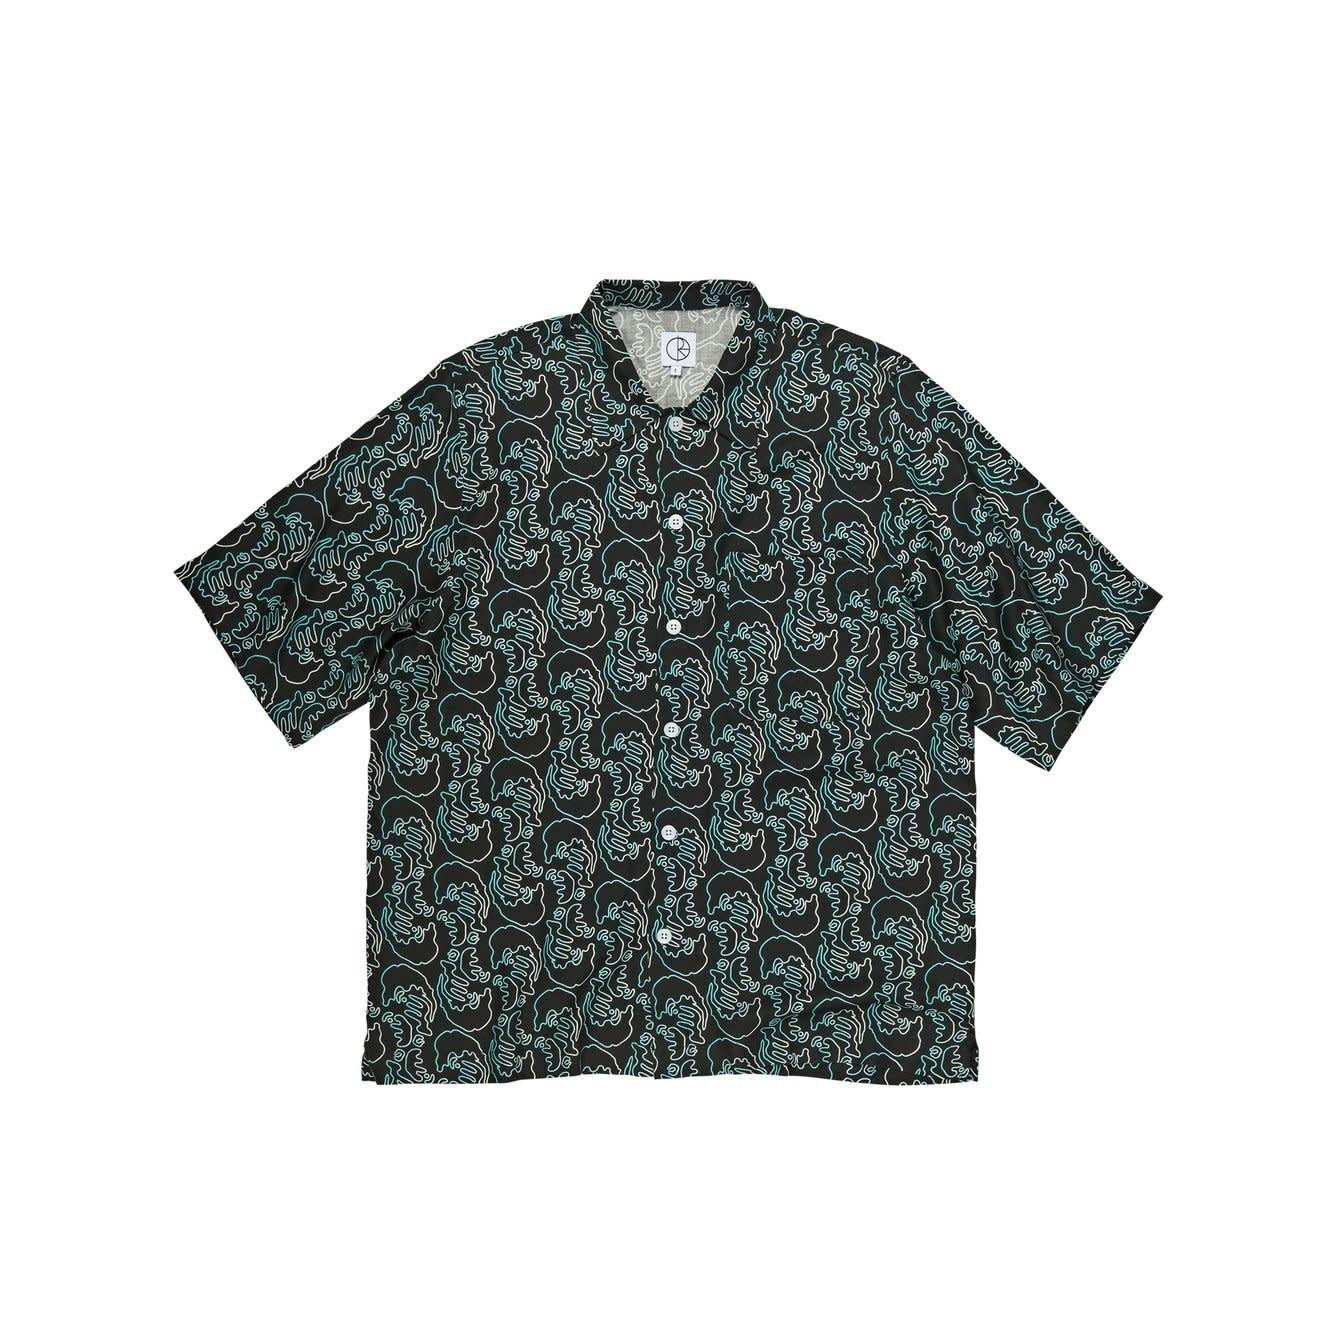 Polar Skate Co. Art Shirt (Faces) Black